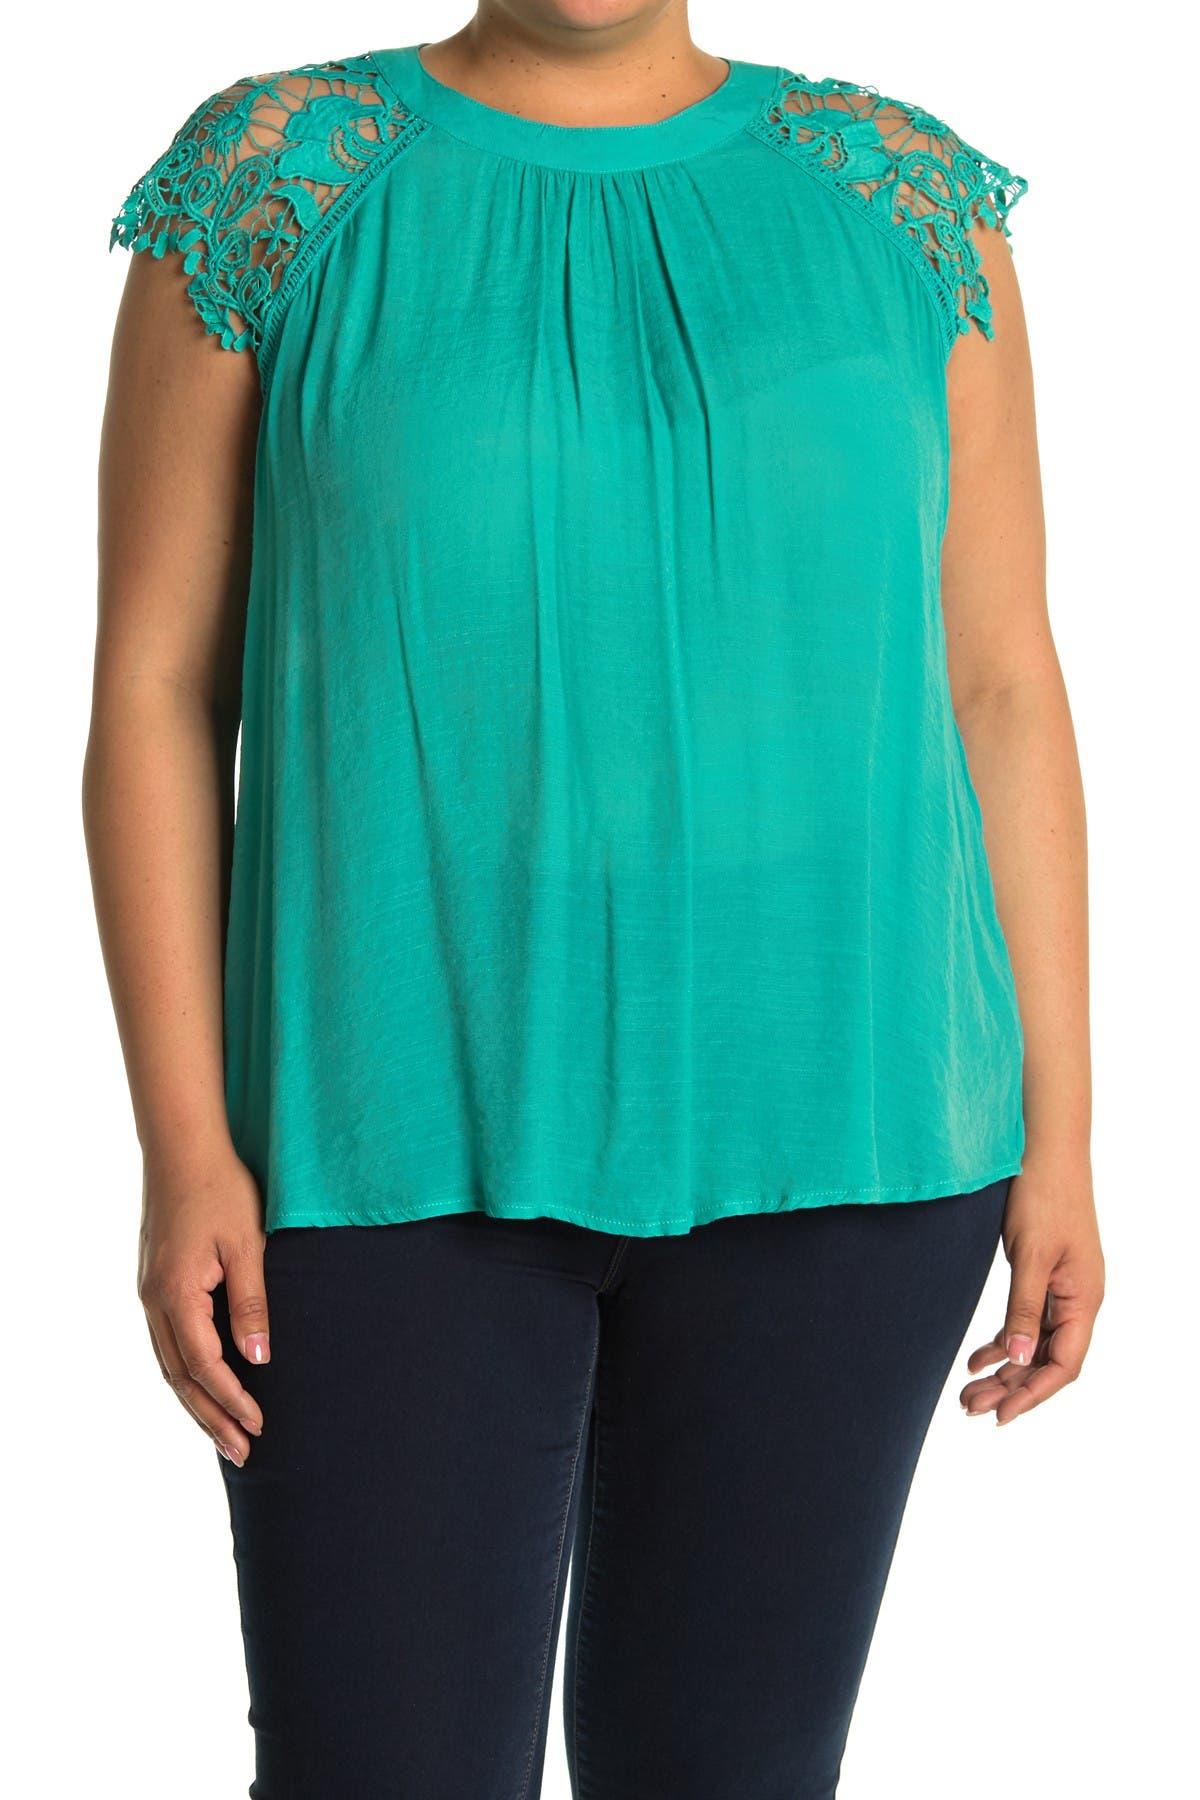 Image of Forgotten Grace Crochet Lace Sleeve Top